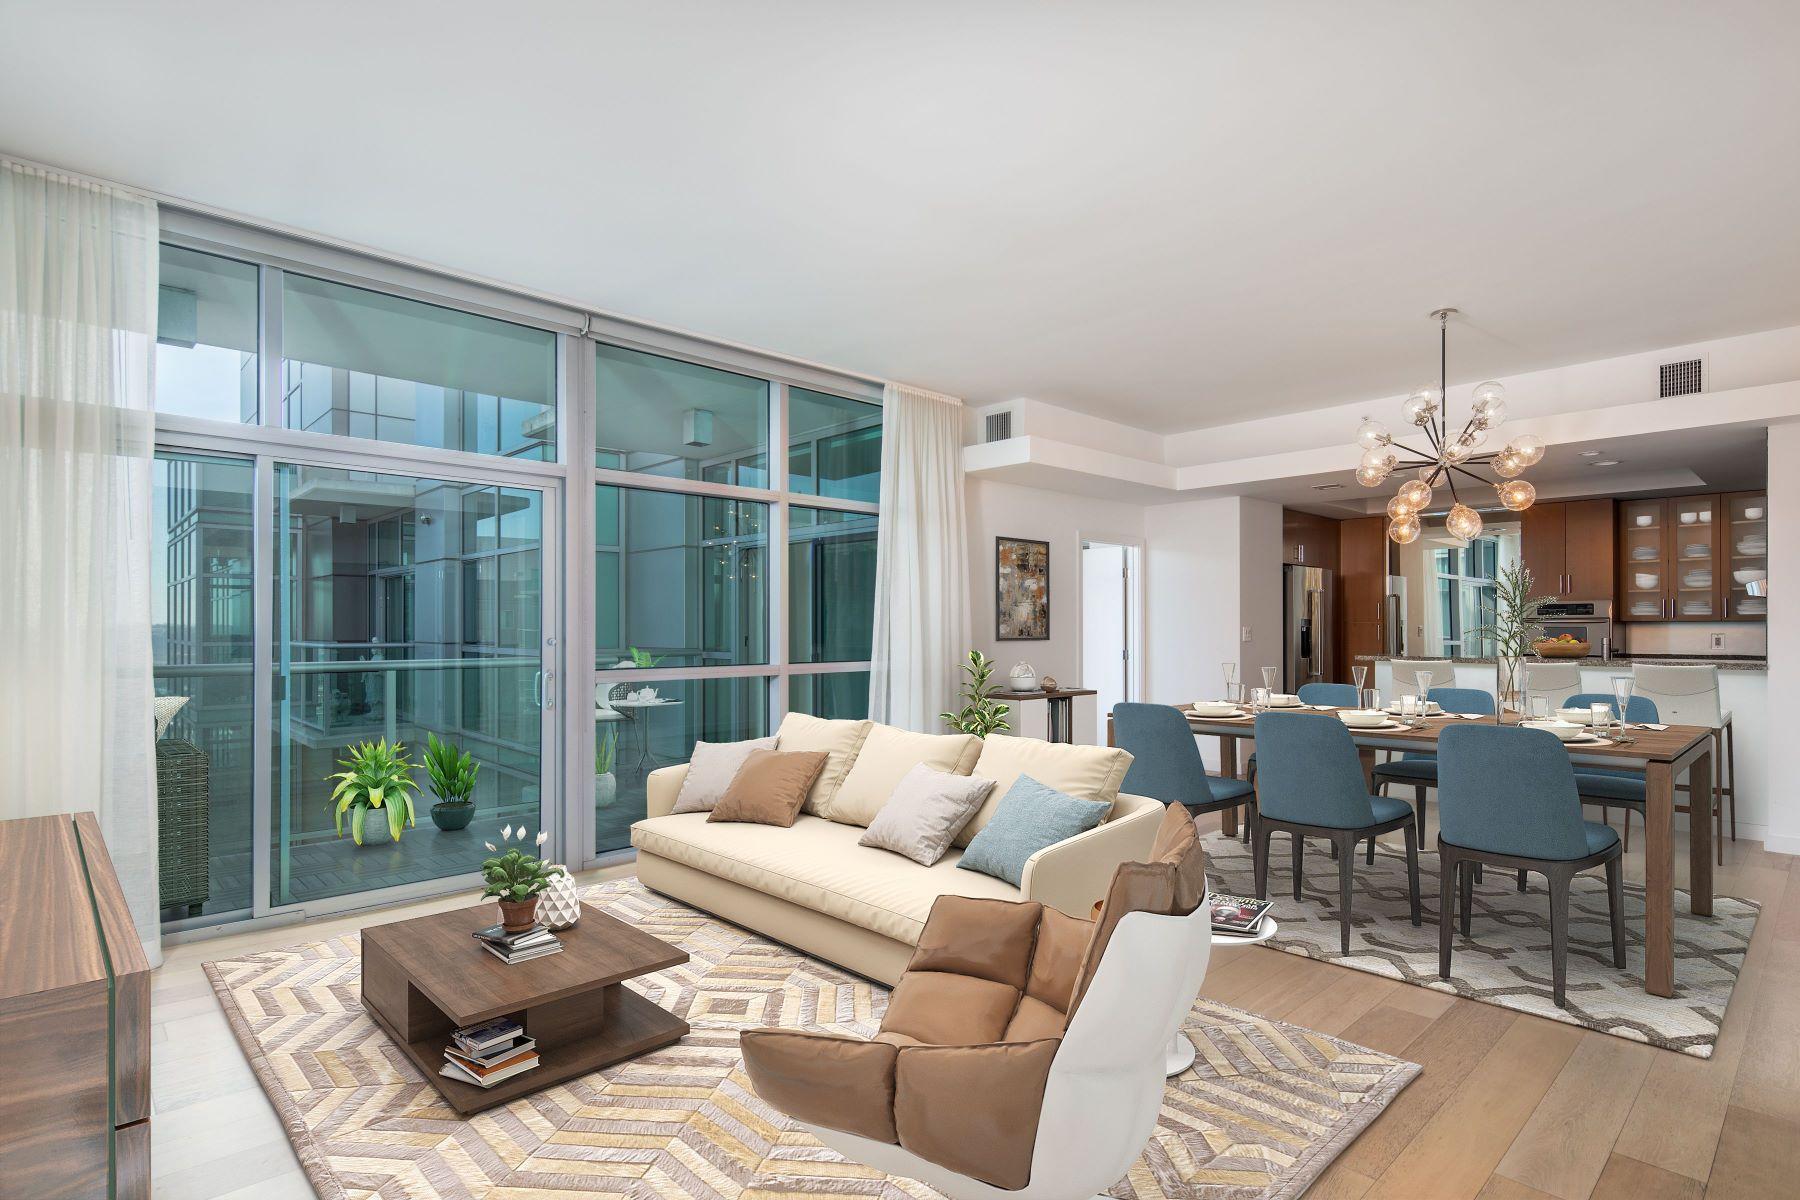 Condominiums for Sale at 13700 Marina Pointe Drive #1918, Marina del Rey, CA 90292 13700 Marina Pointe Drive #1918 Marina Del Rey, California 90292 United States